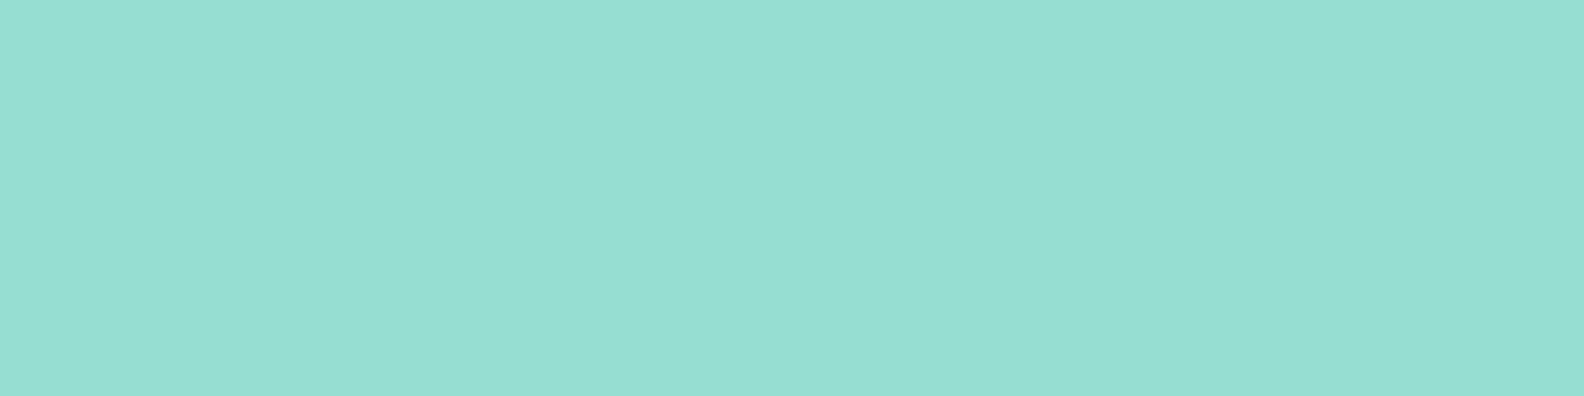 1584x396 Pale Robin Egg Blue Solid Color Background